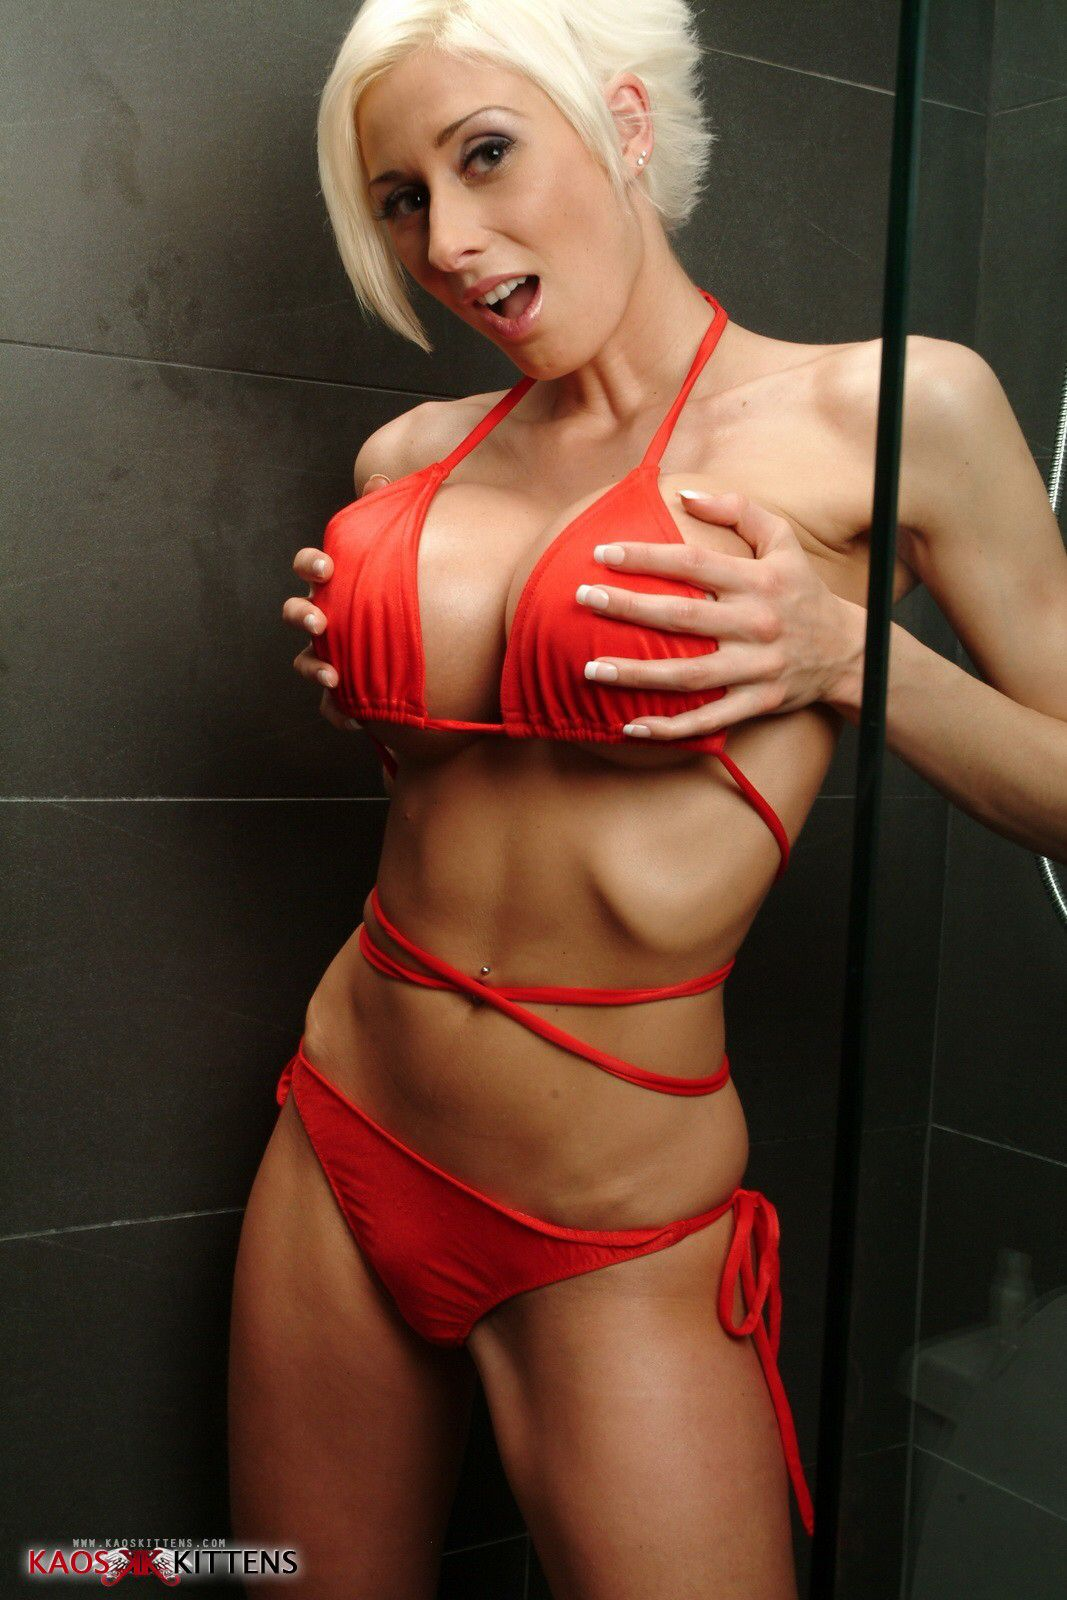 Elinor gasset porn star